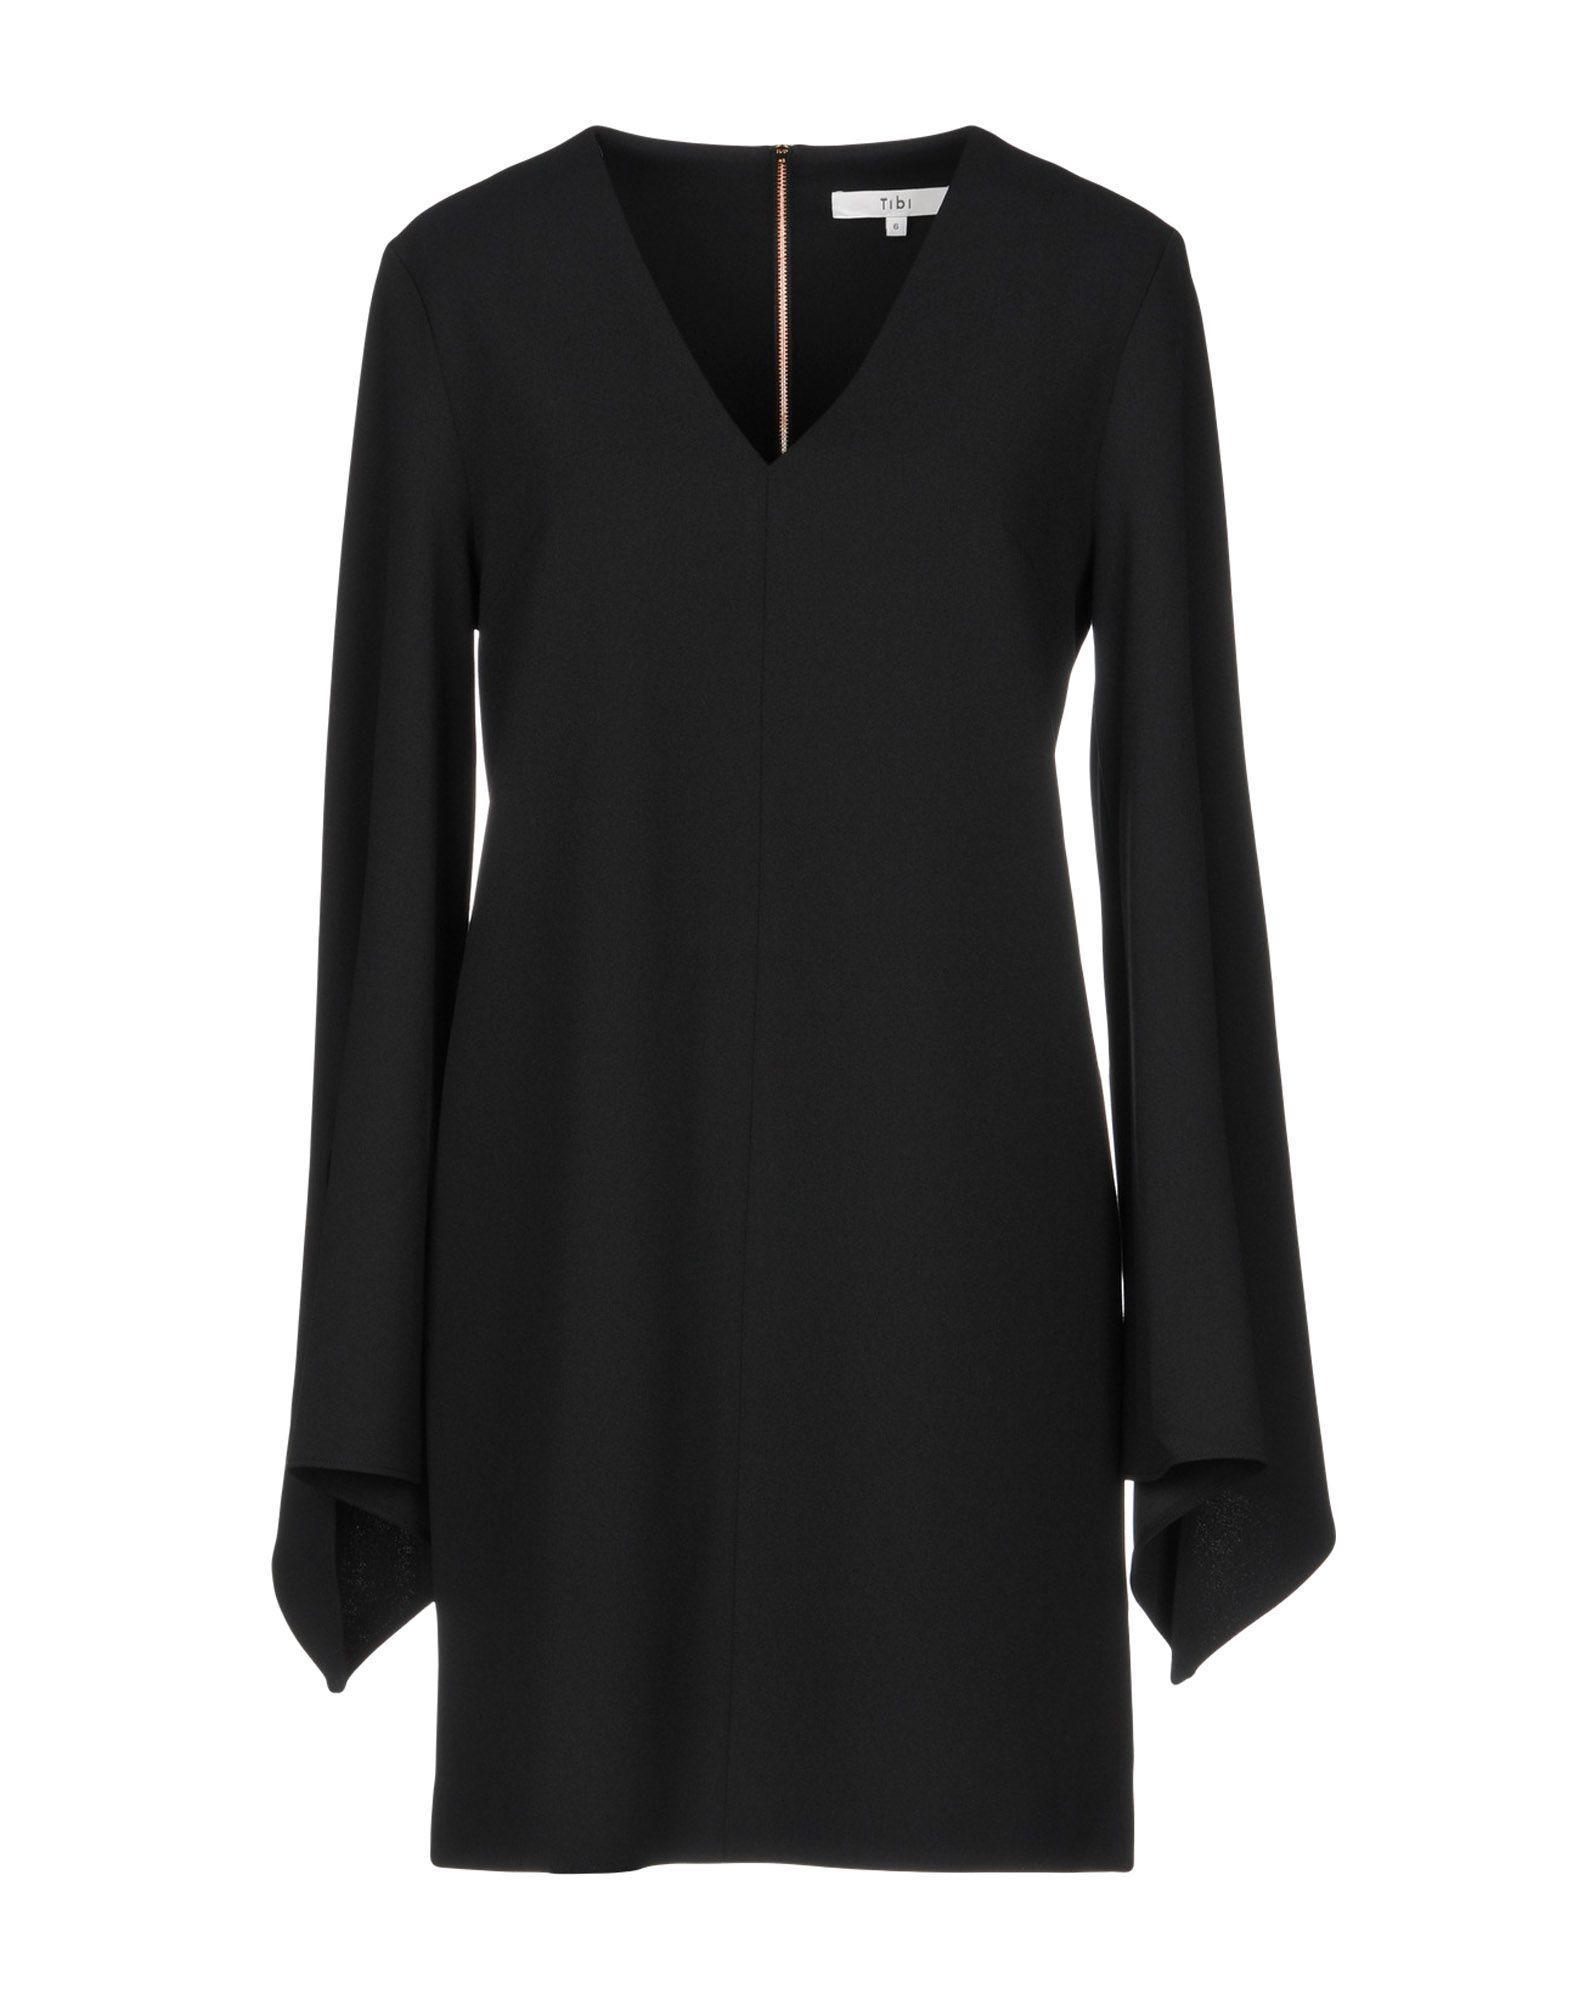 Tibi Short Dress In Black